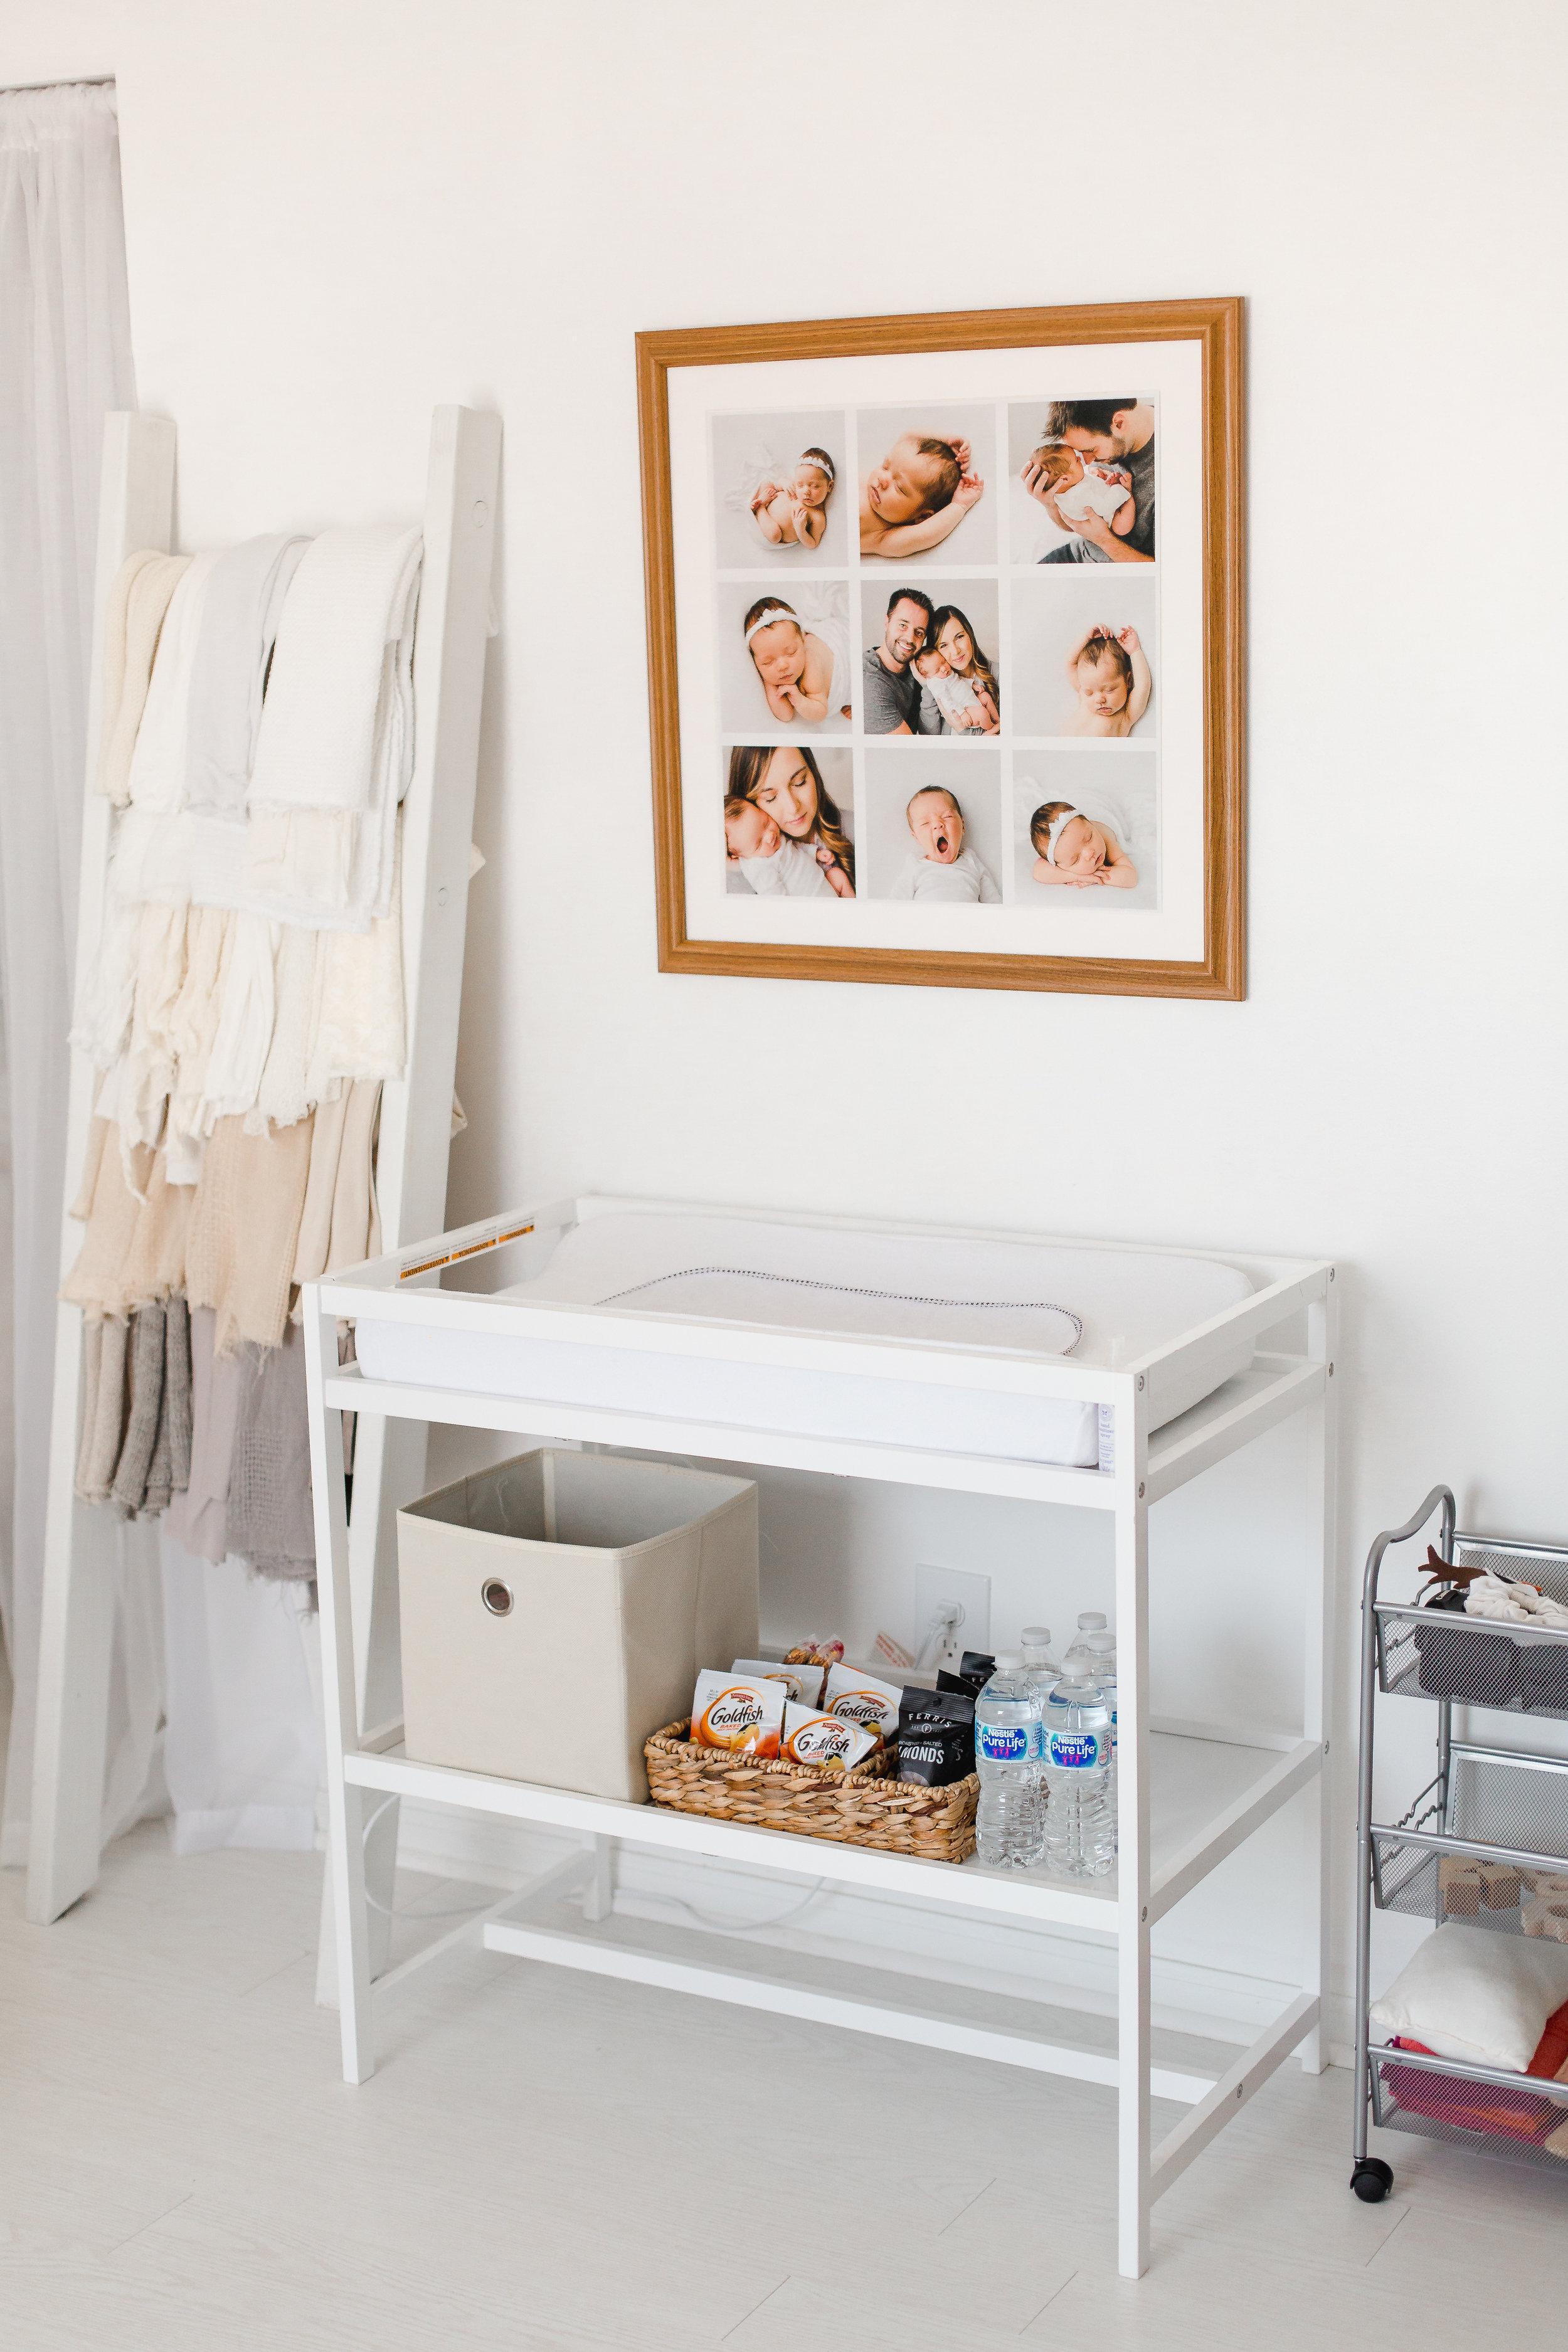 central-ohio-newborn-photographer-7 - Copy.jpg